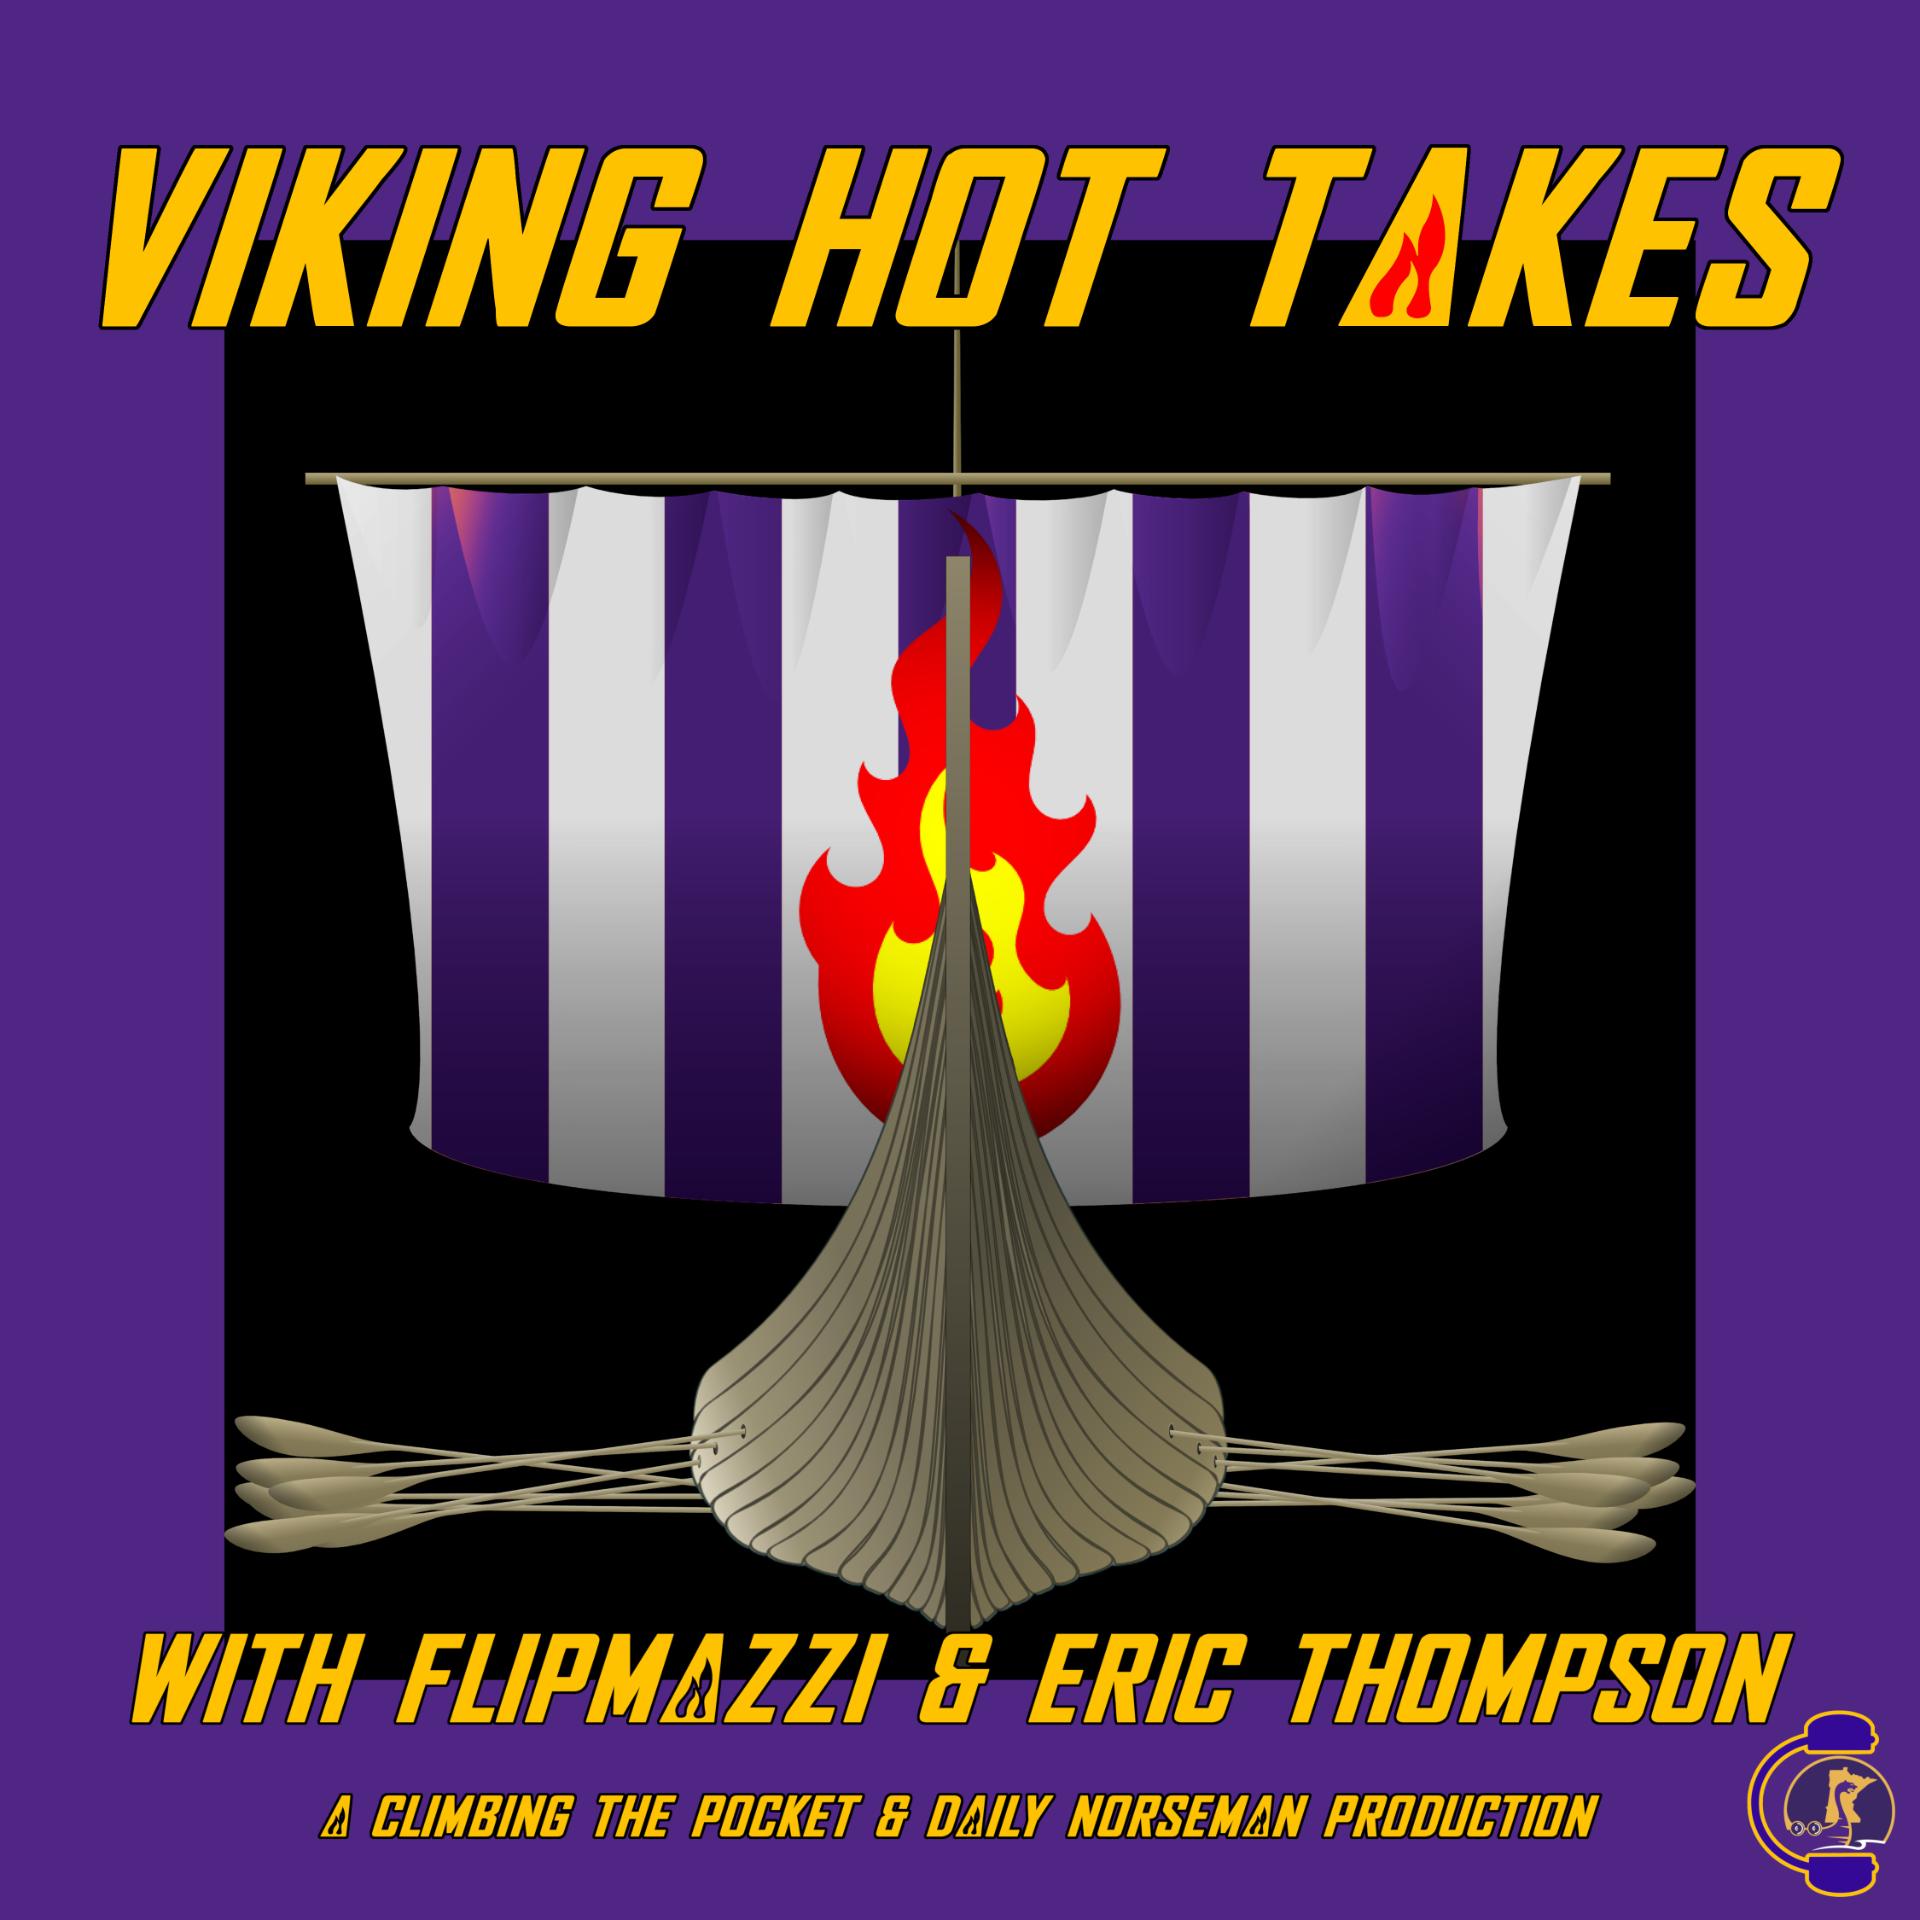 Vikings Hot Takes